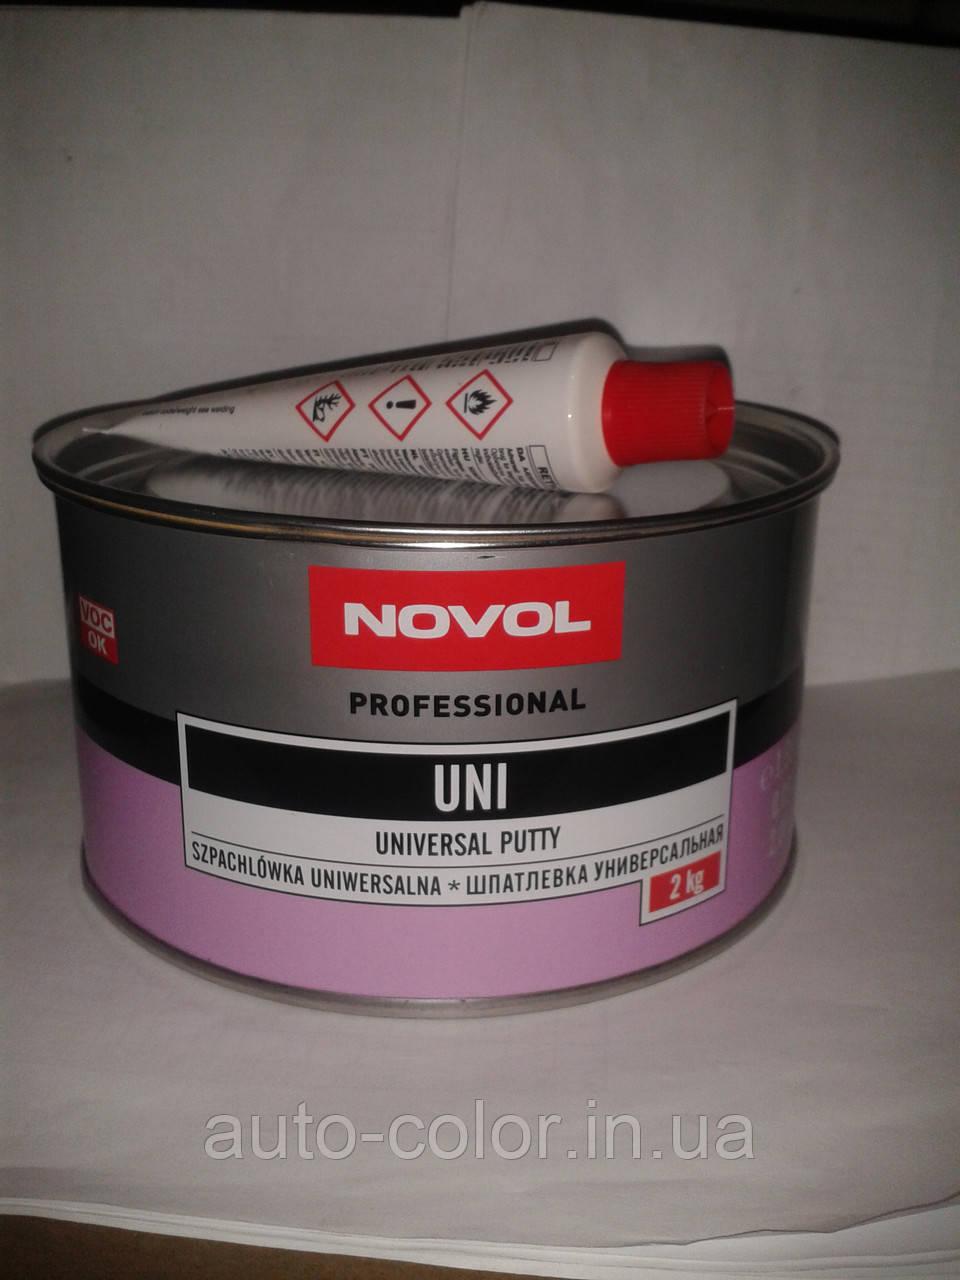 Шпатлёвка универсальная Novol, 2 кг